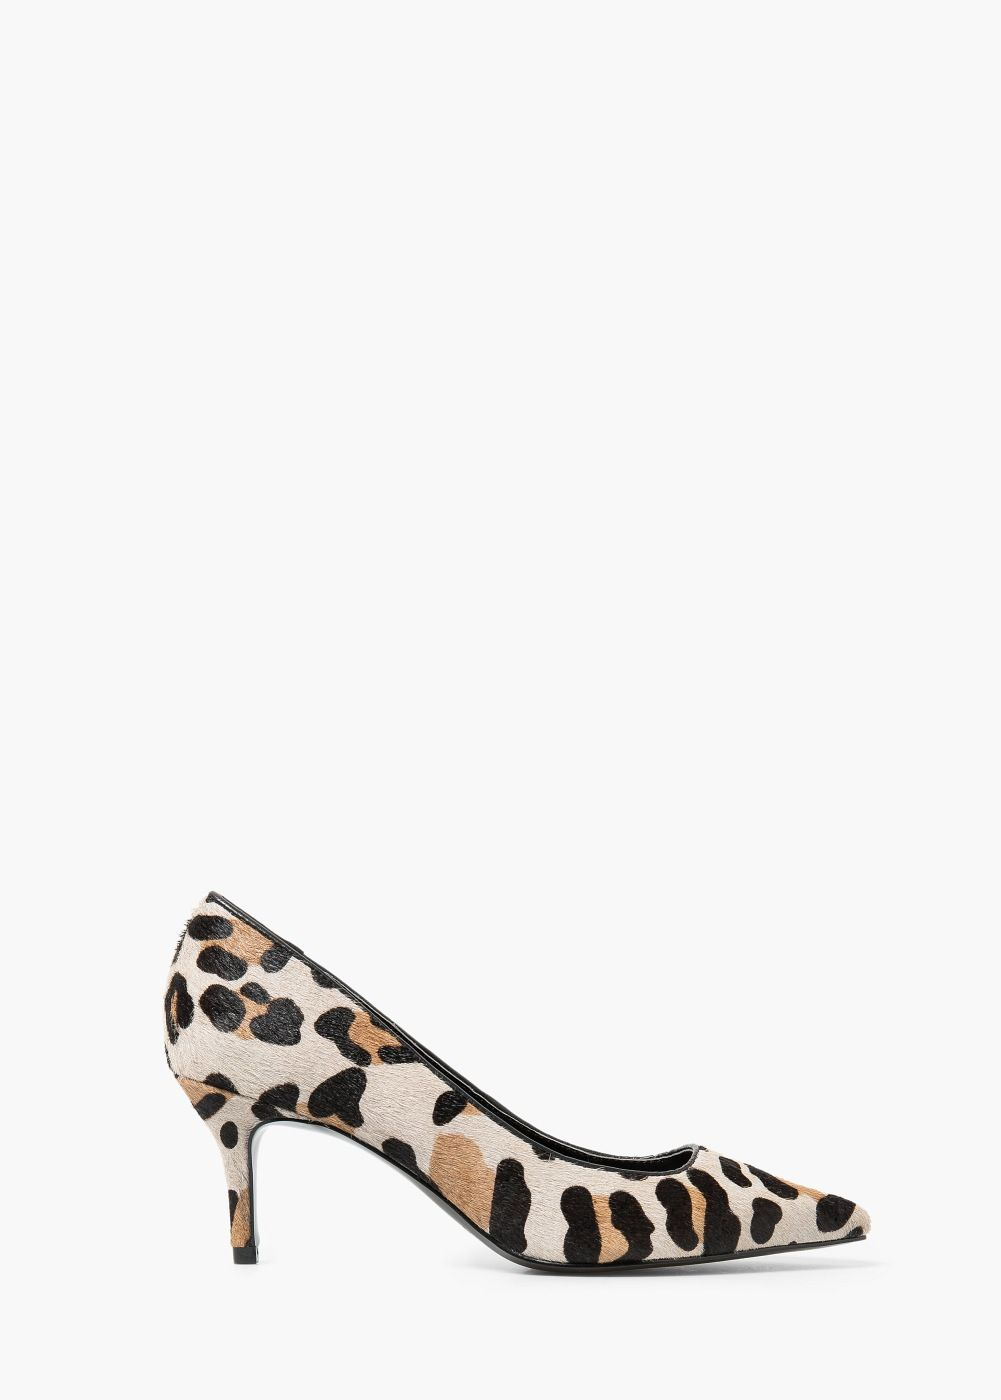 aeb8a9ded68d Escarpins léopard - Femme